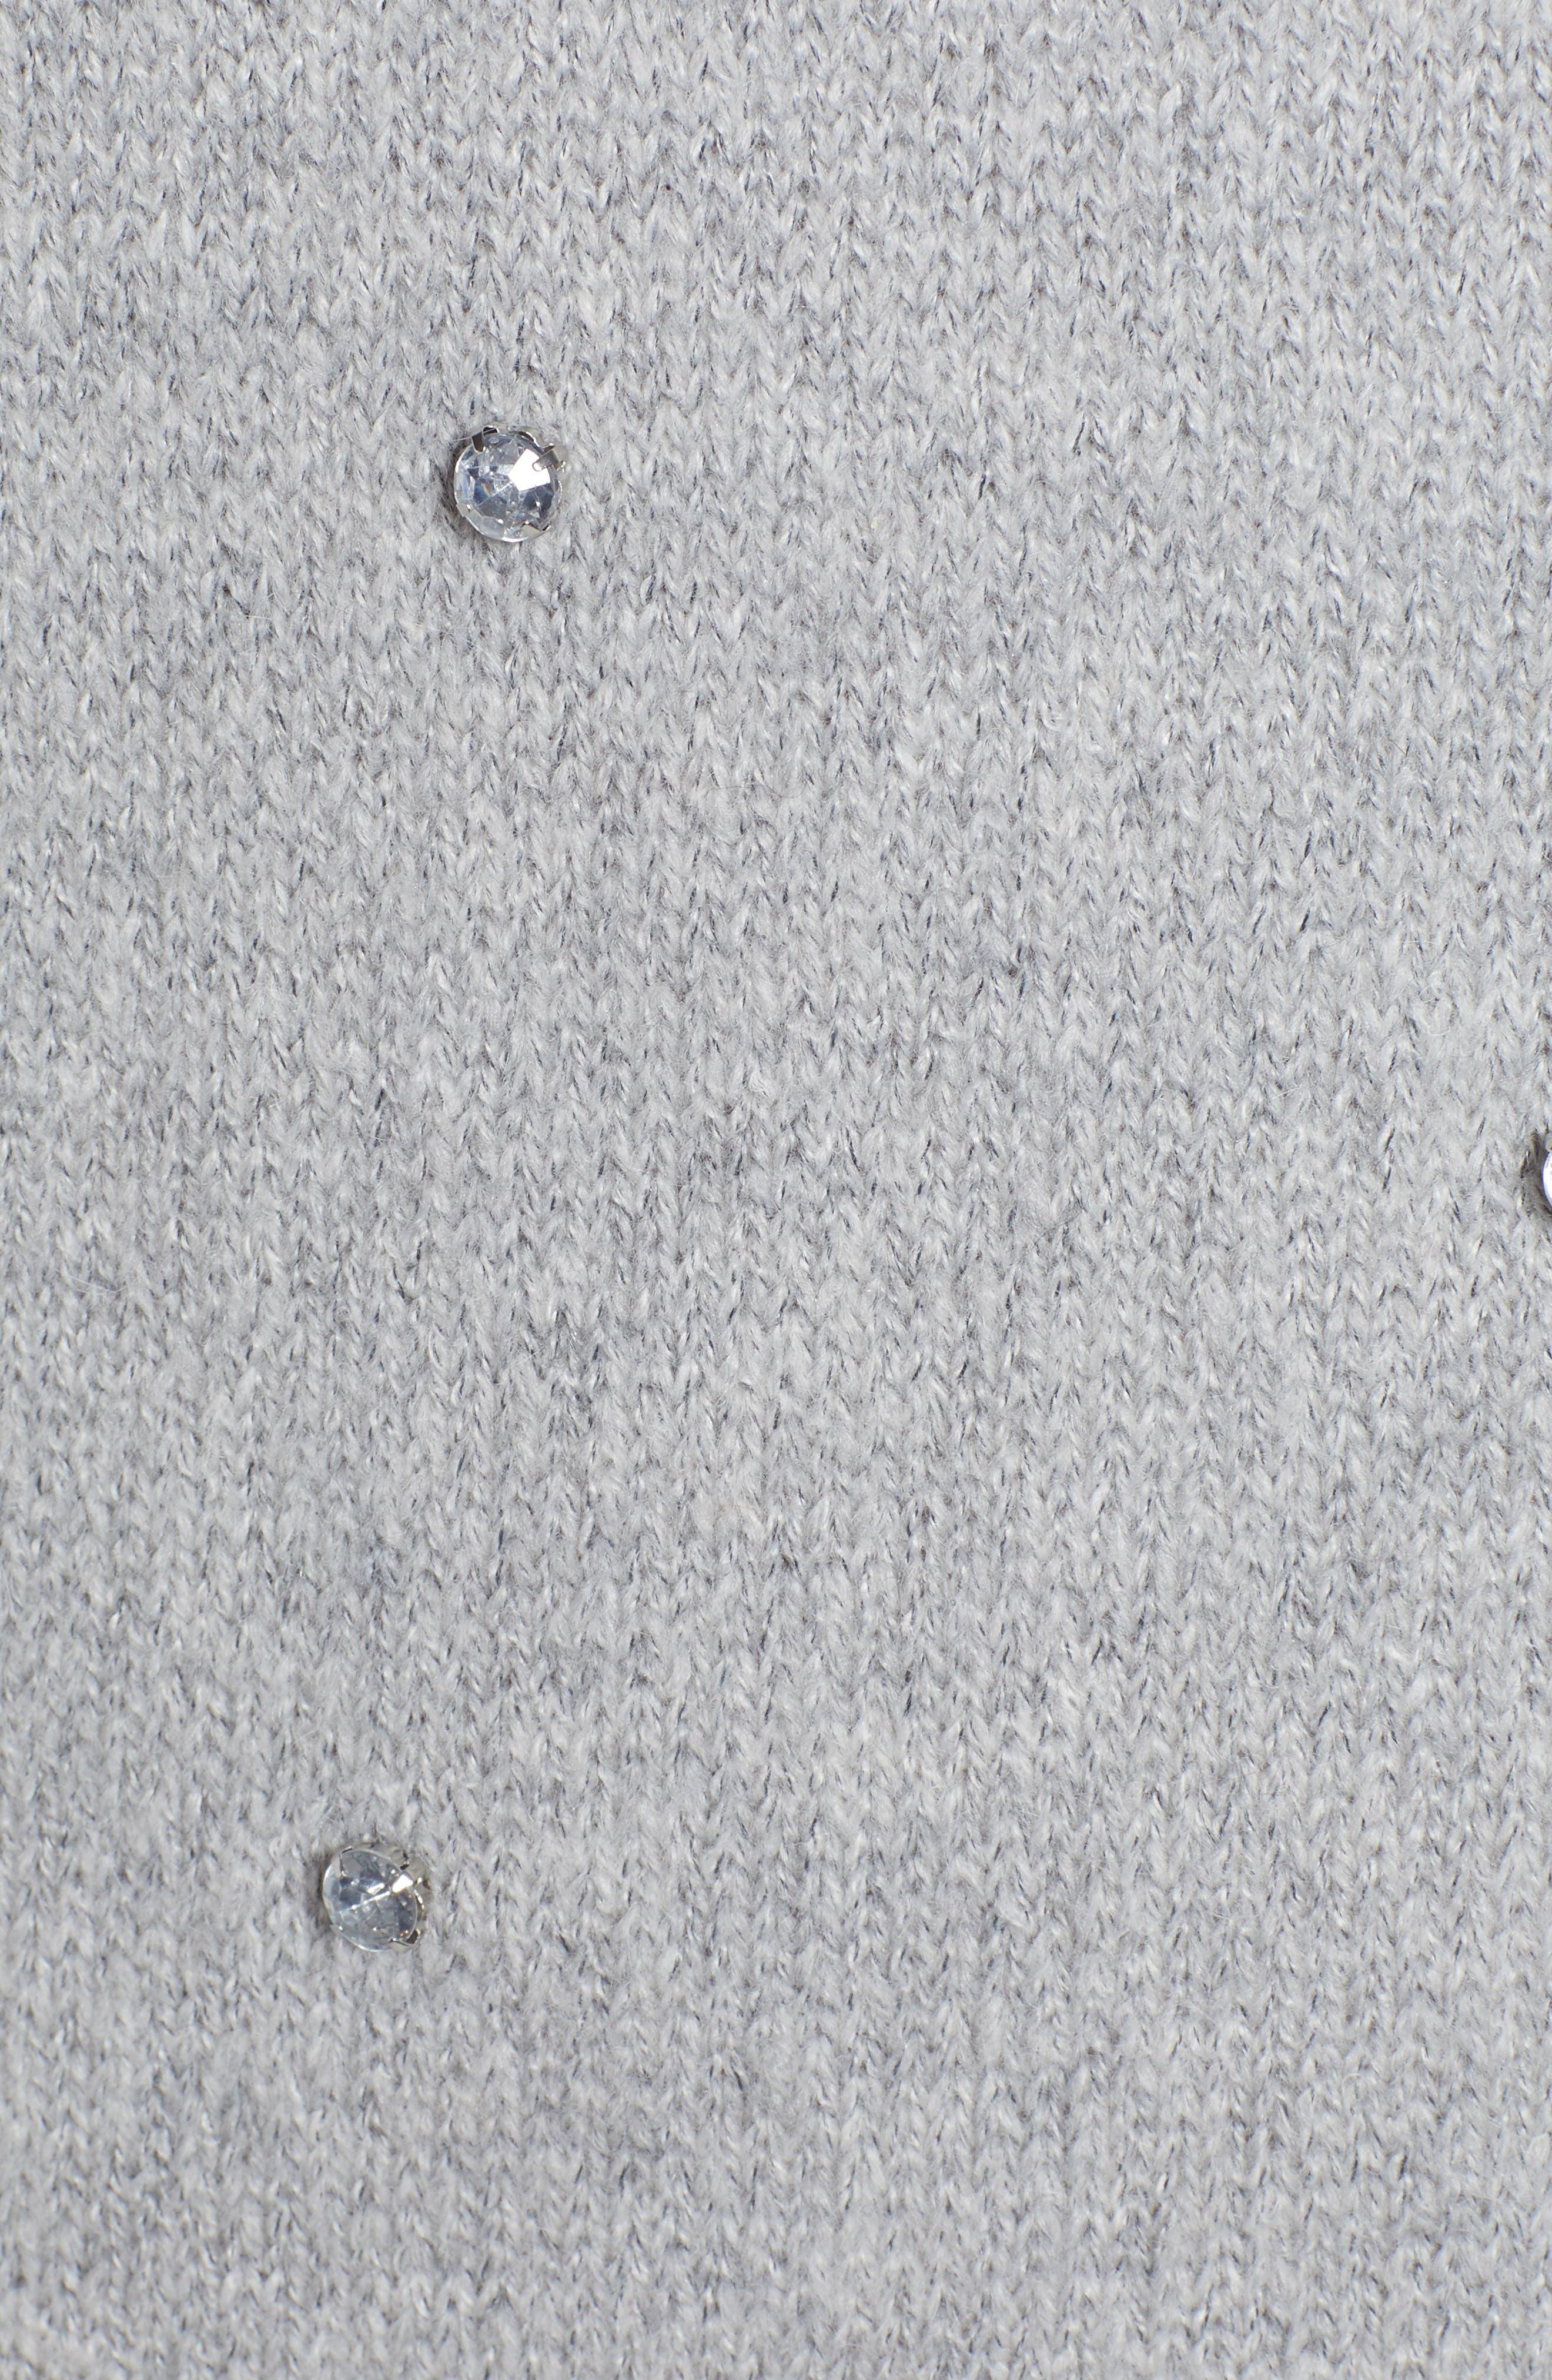 Embellished Ruffle Neck Sweater,                             Alternate thumbnail 5, color,                             GREY LIGHT HEATHER